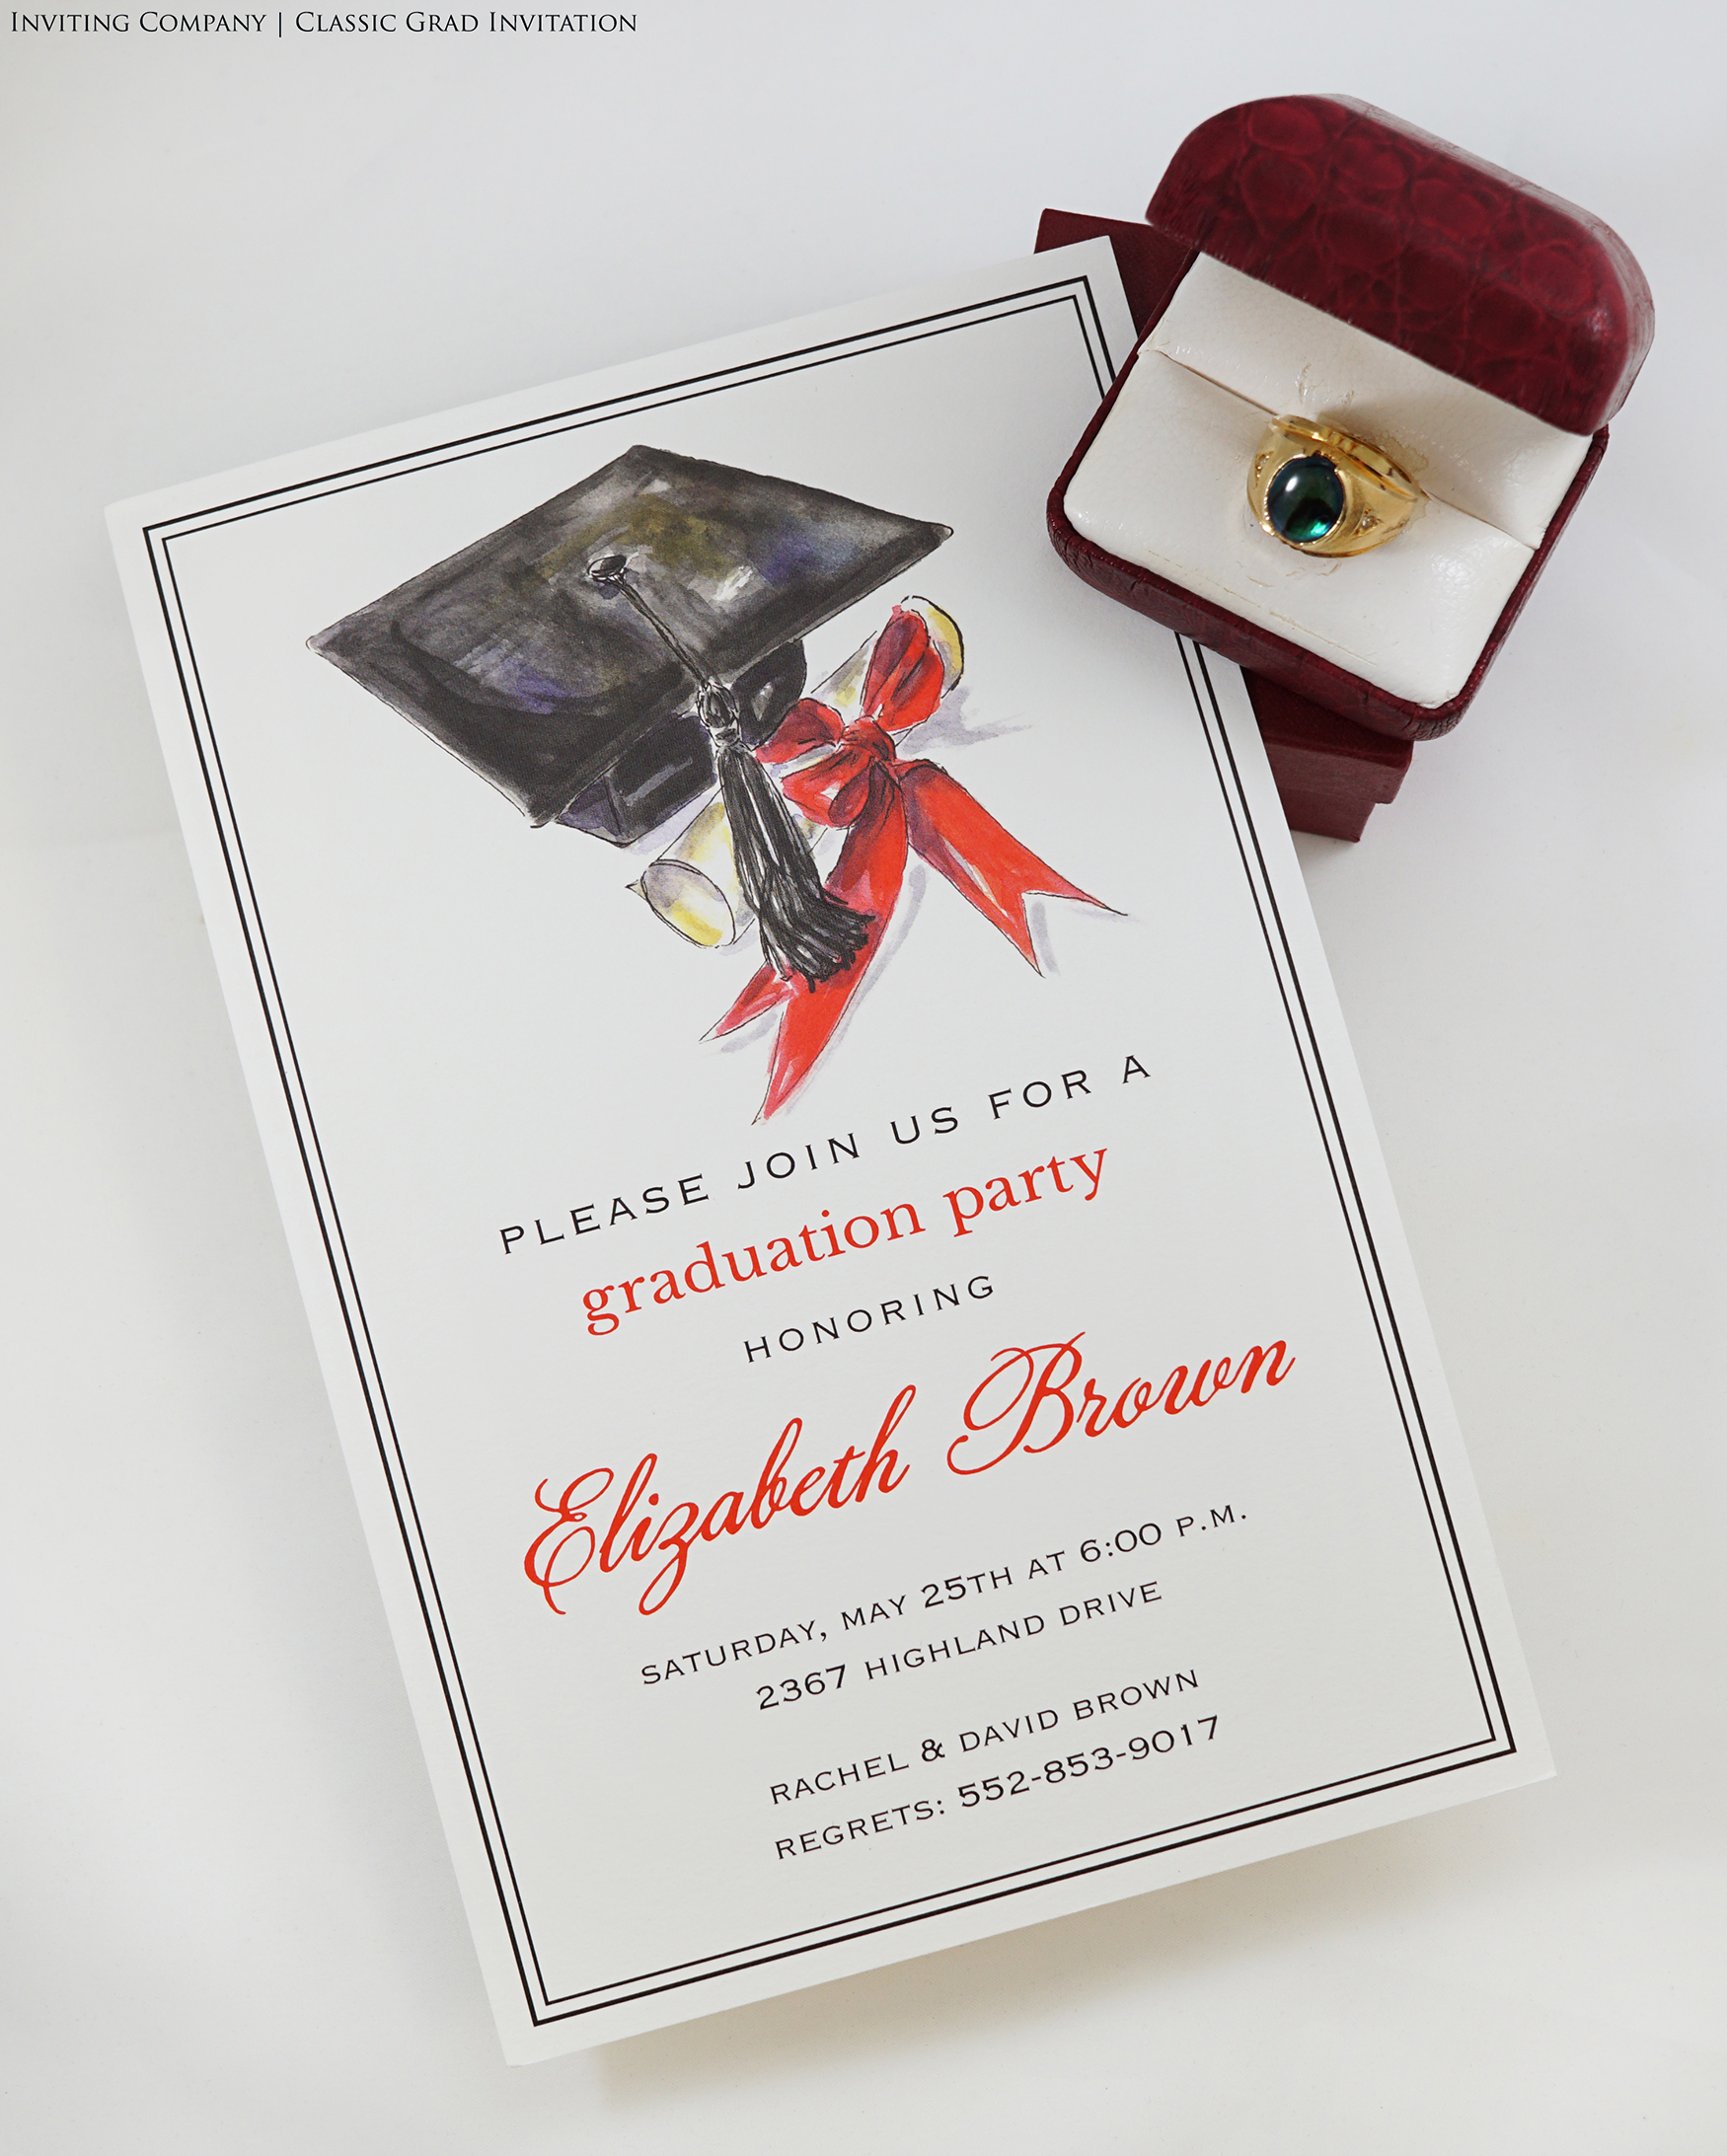 Inviting Co Graduation